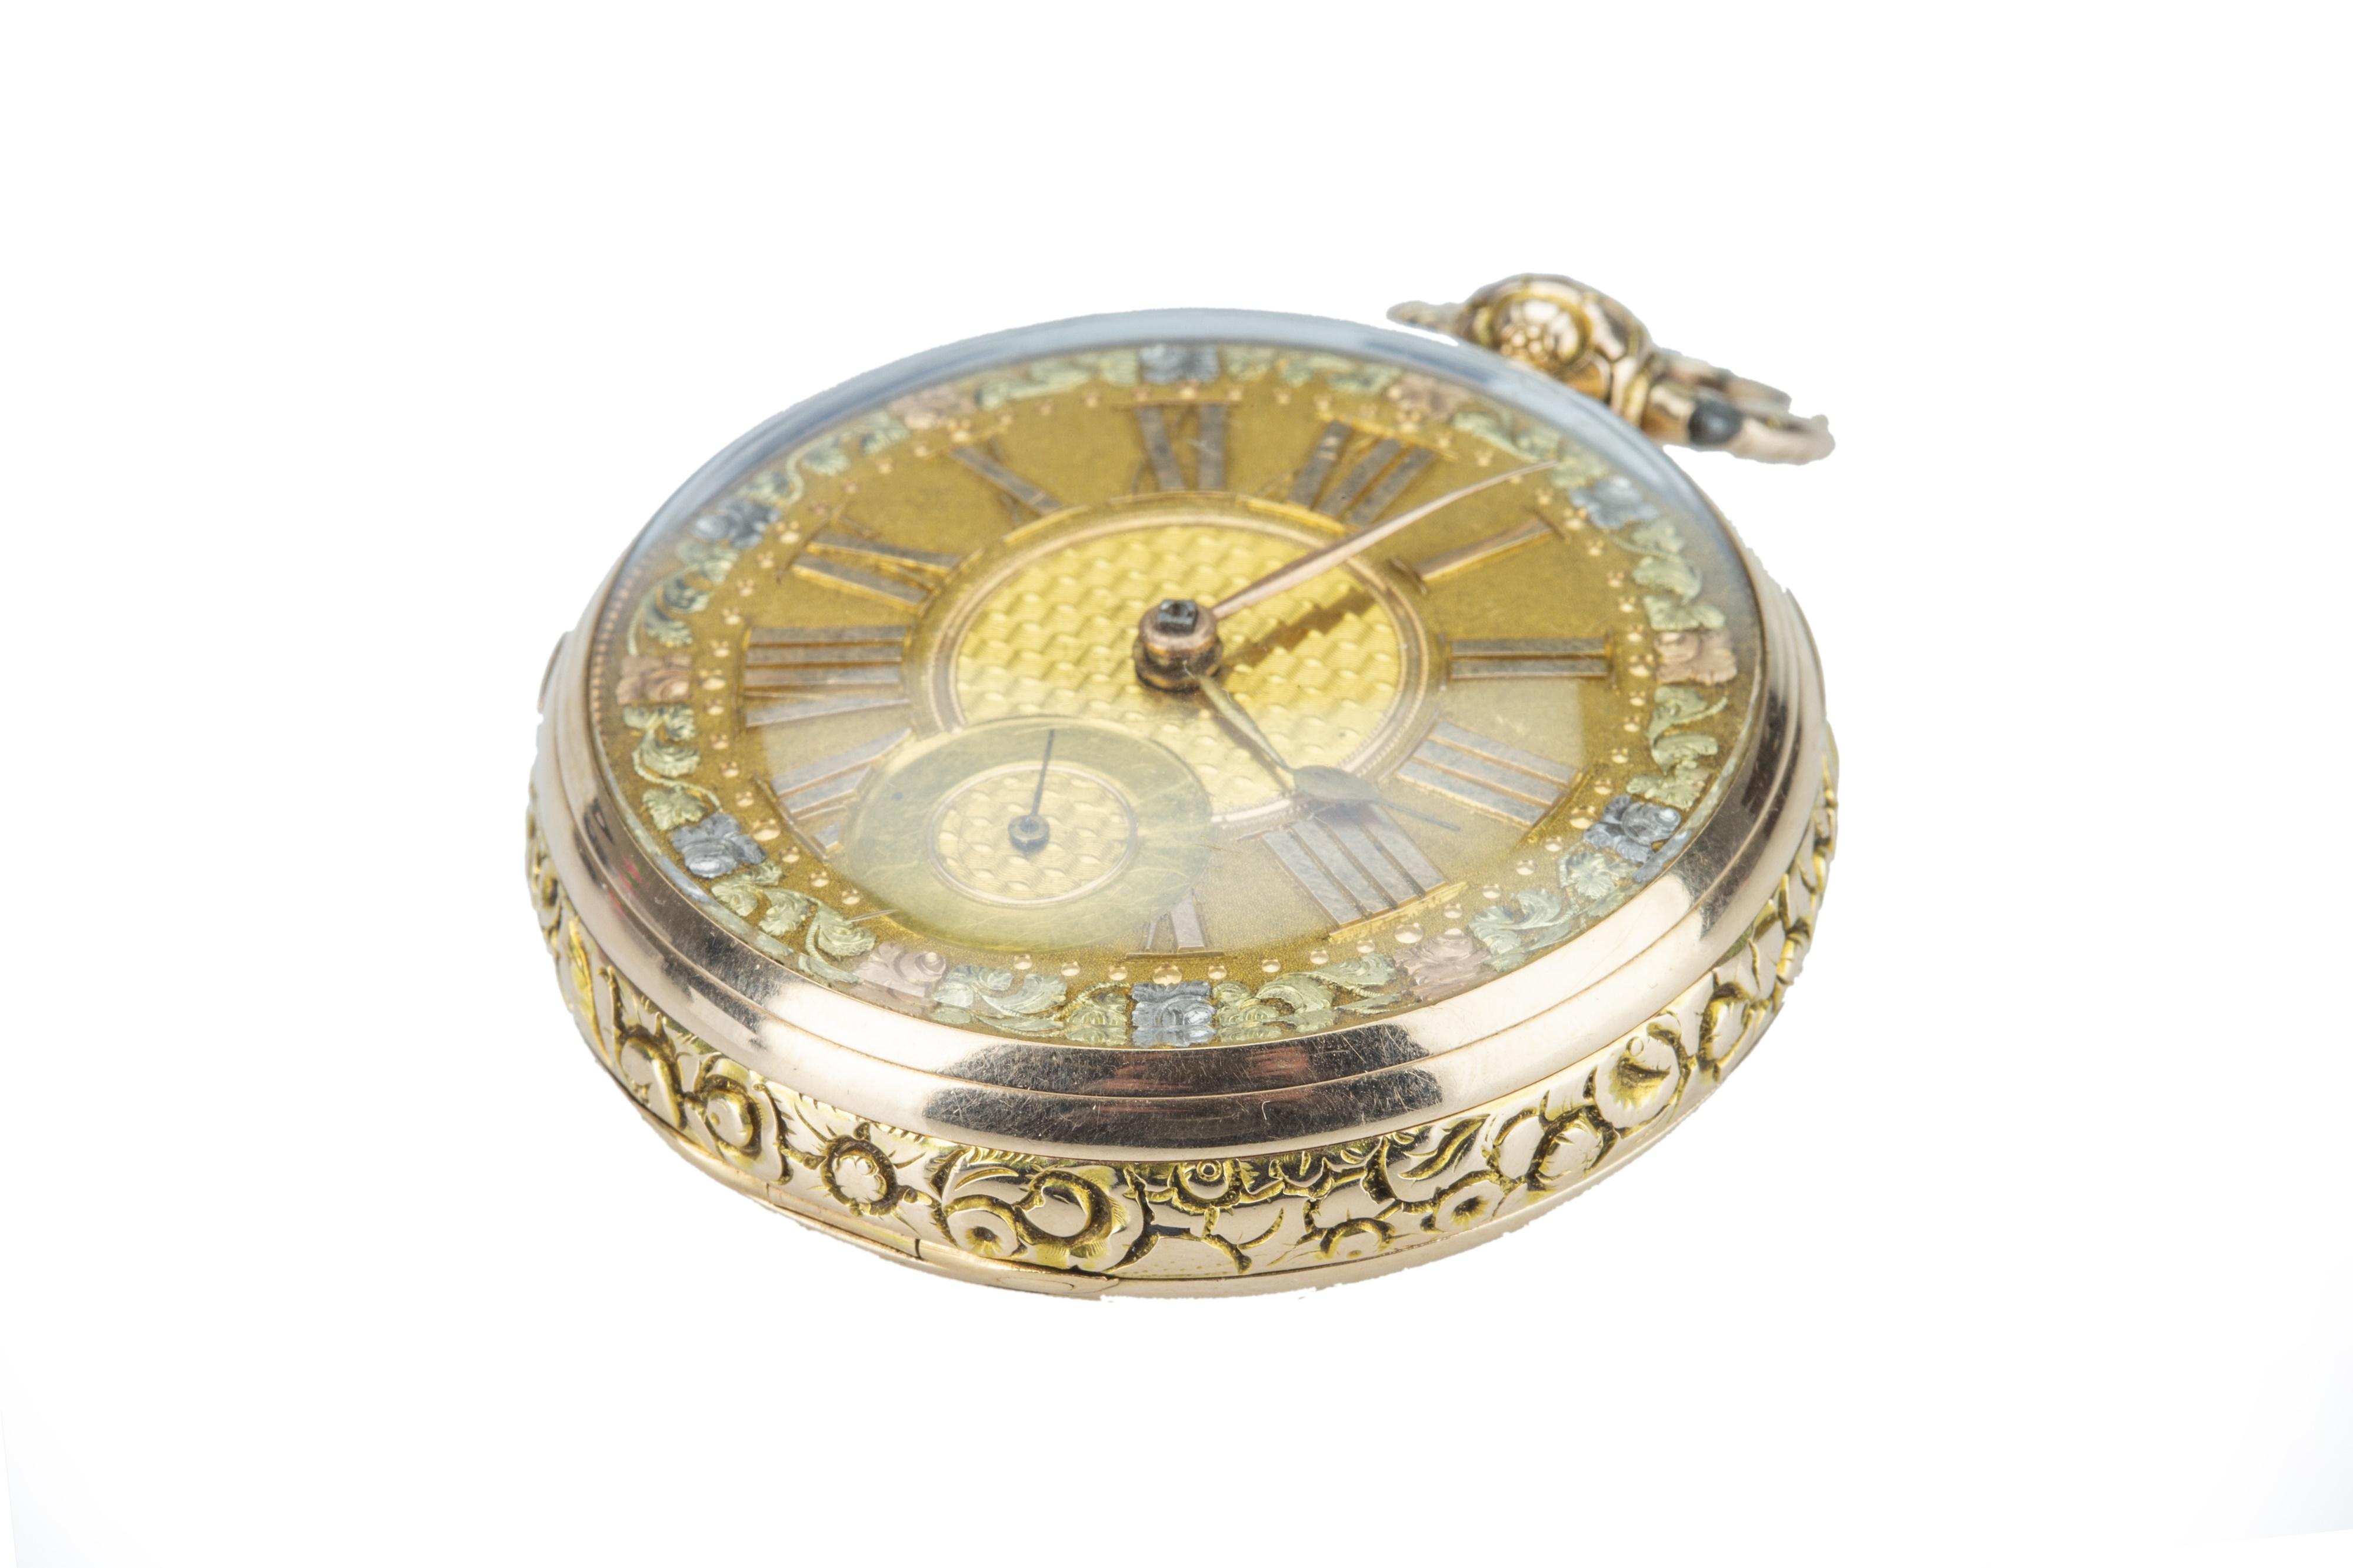 A George IV Irish 18ct gold pocket watch. - Image 4 of 7